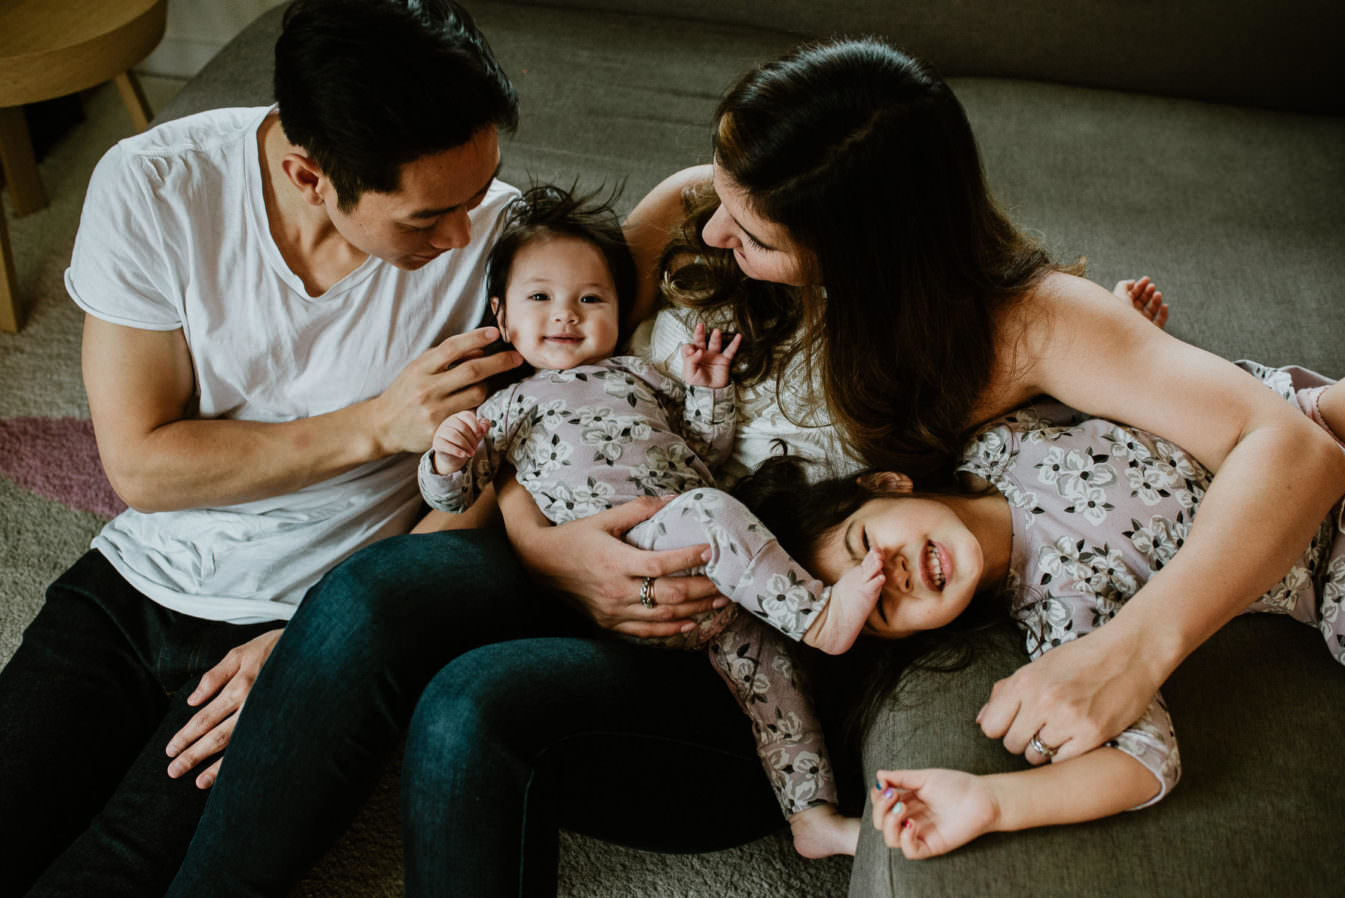 vancouver lifestyle family photographer, newborn photographer